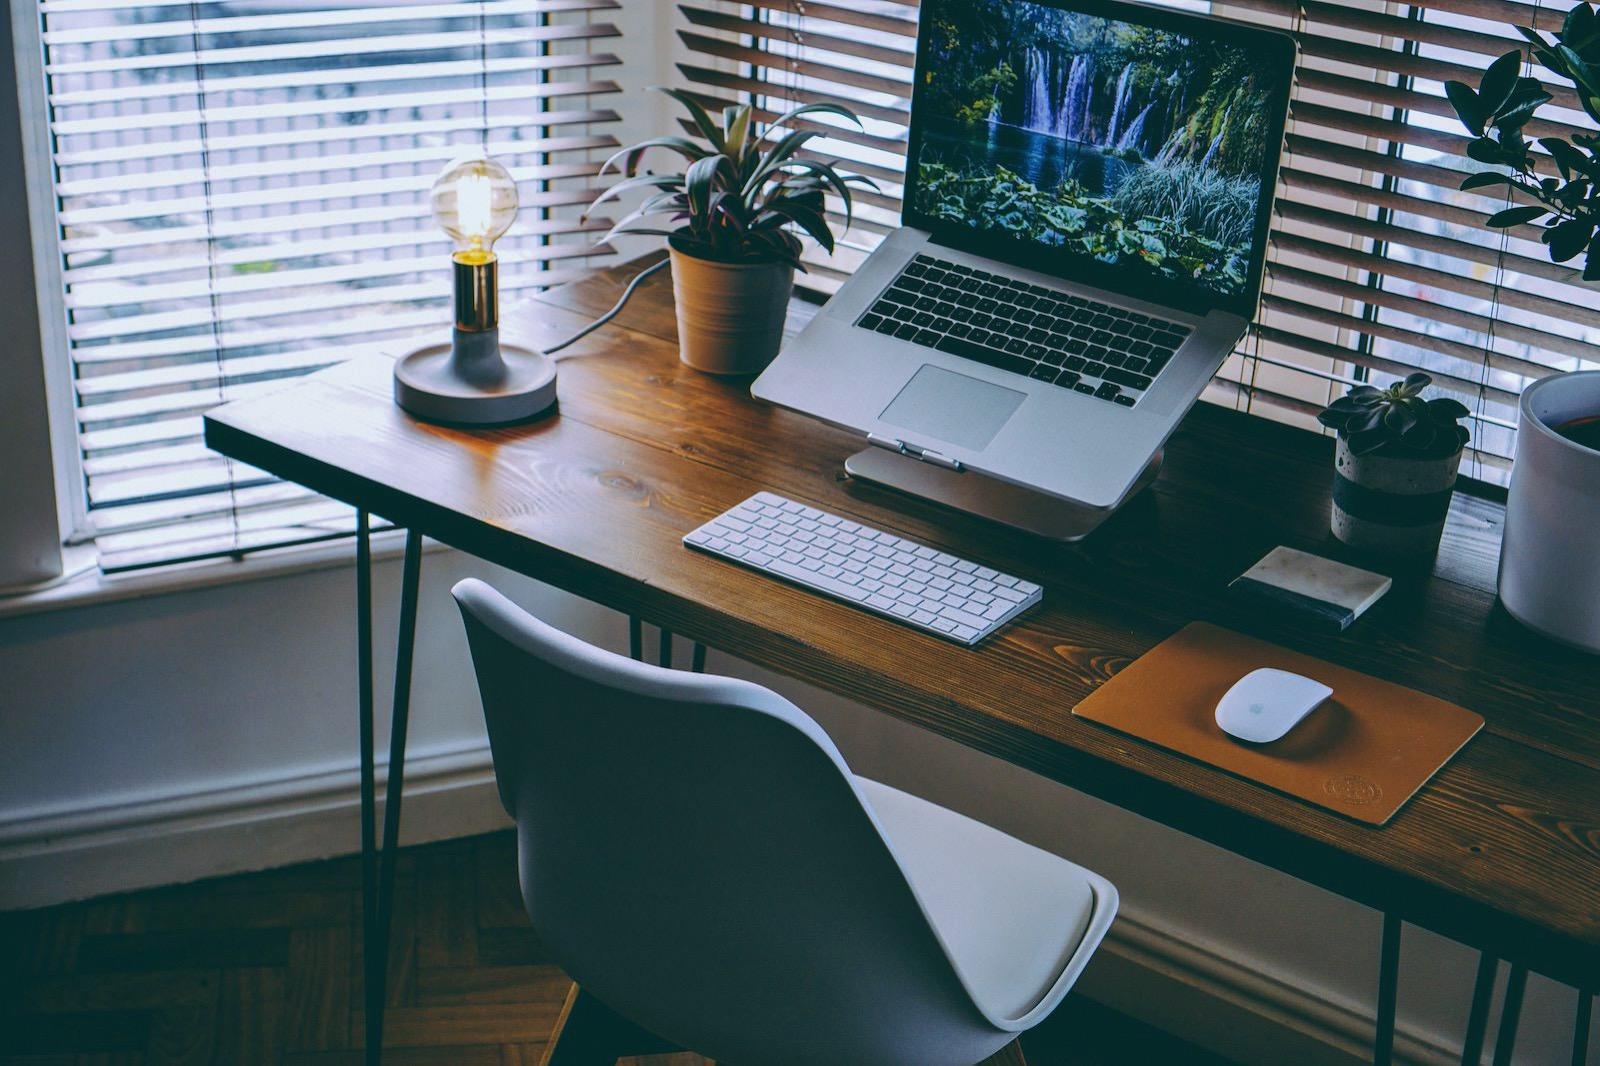 Nathan riley 9q3I8XhesQI unsplash macbook workspace